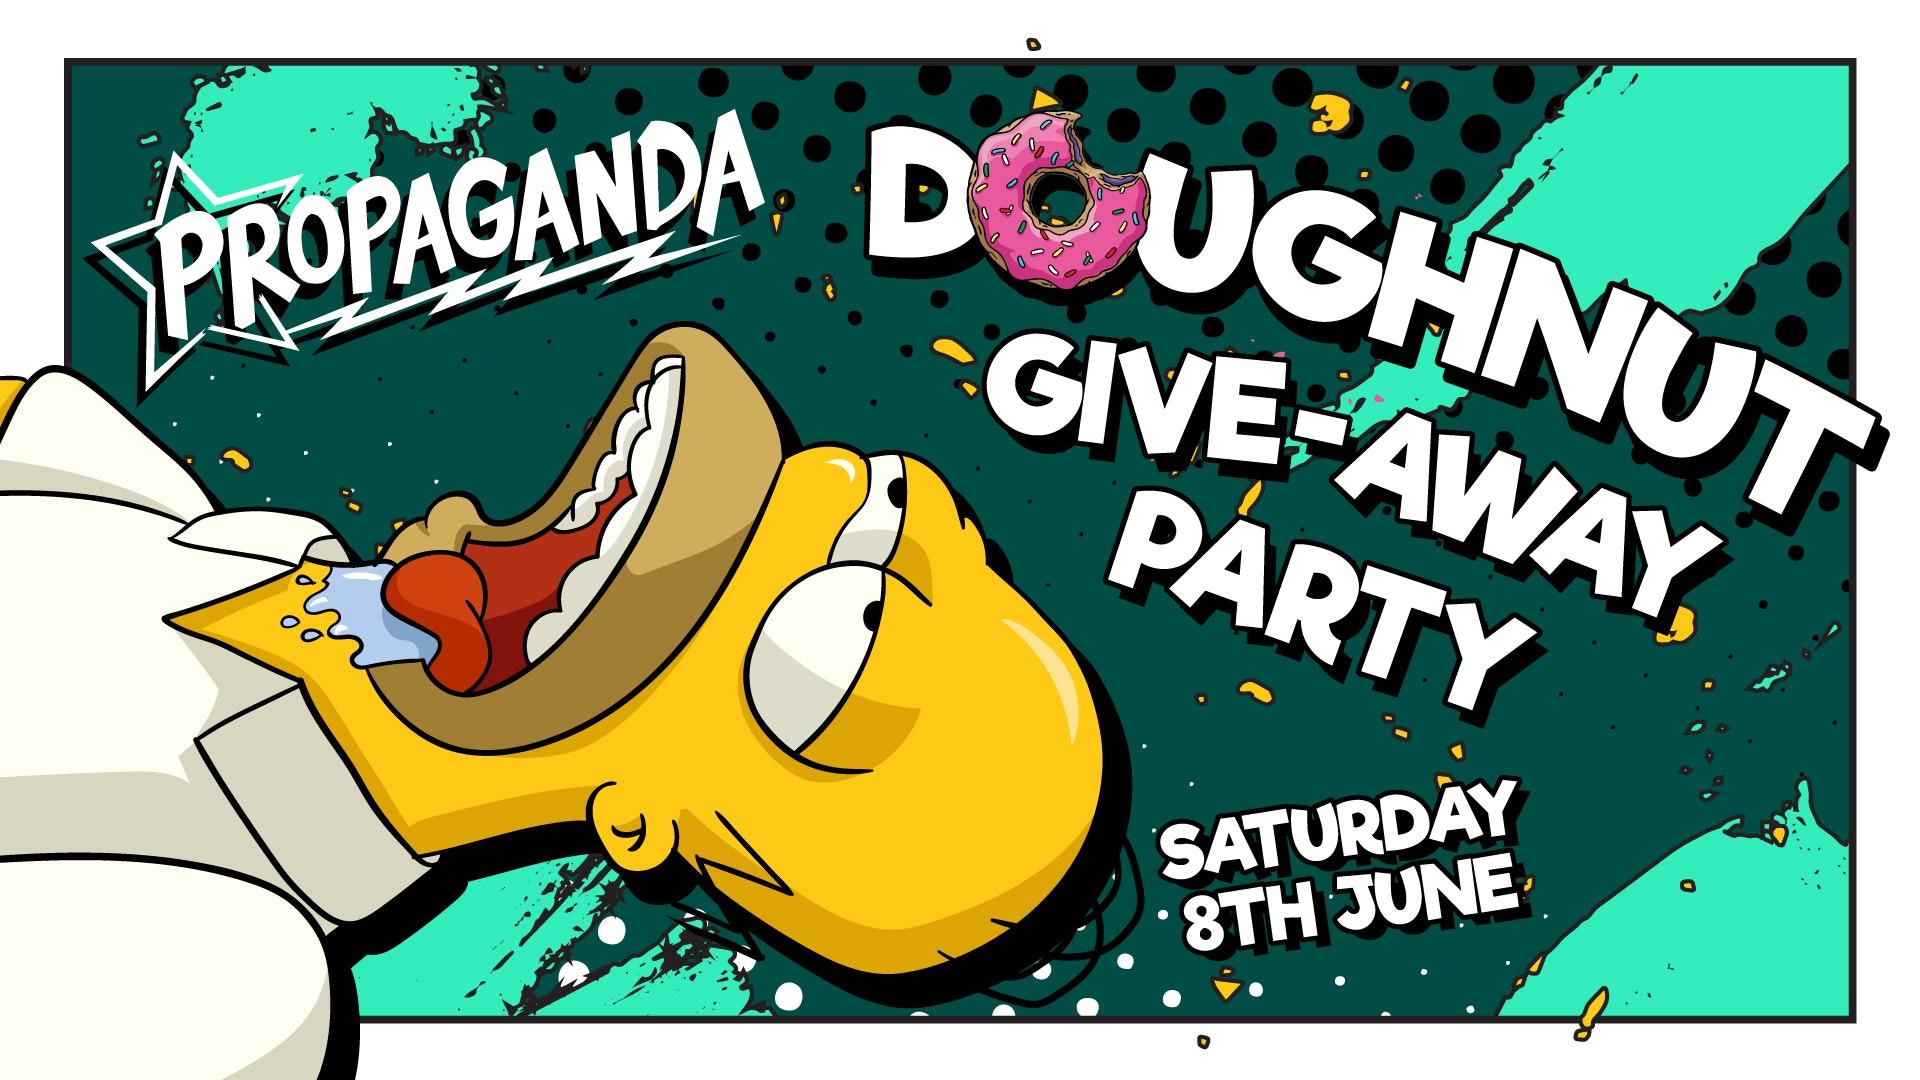 Propaganda London – Doughnut Party